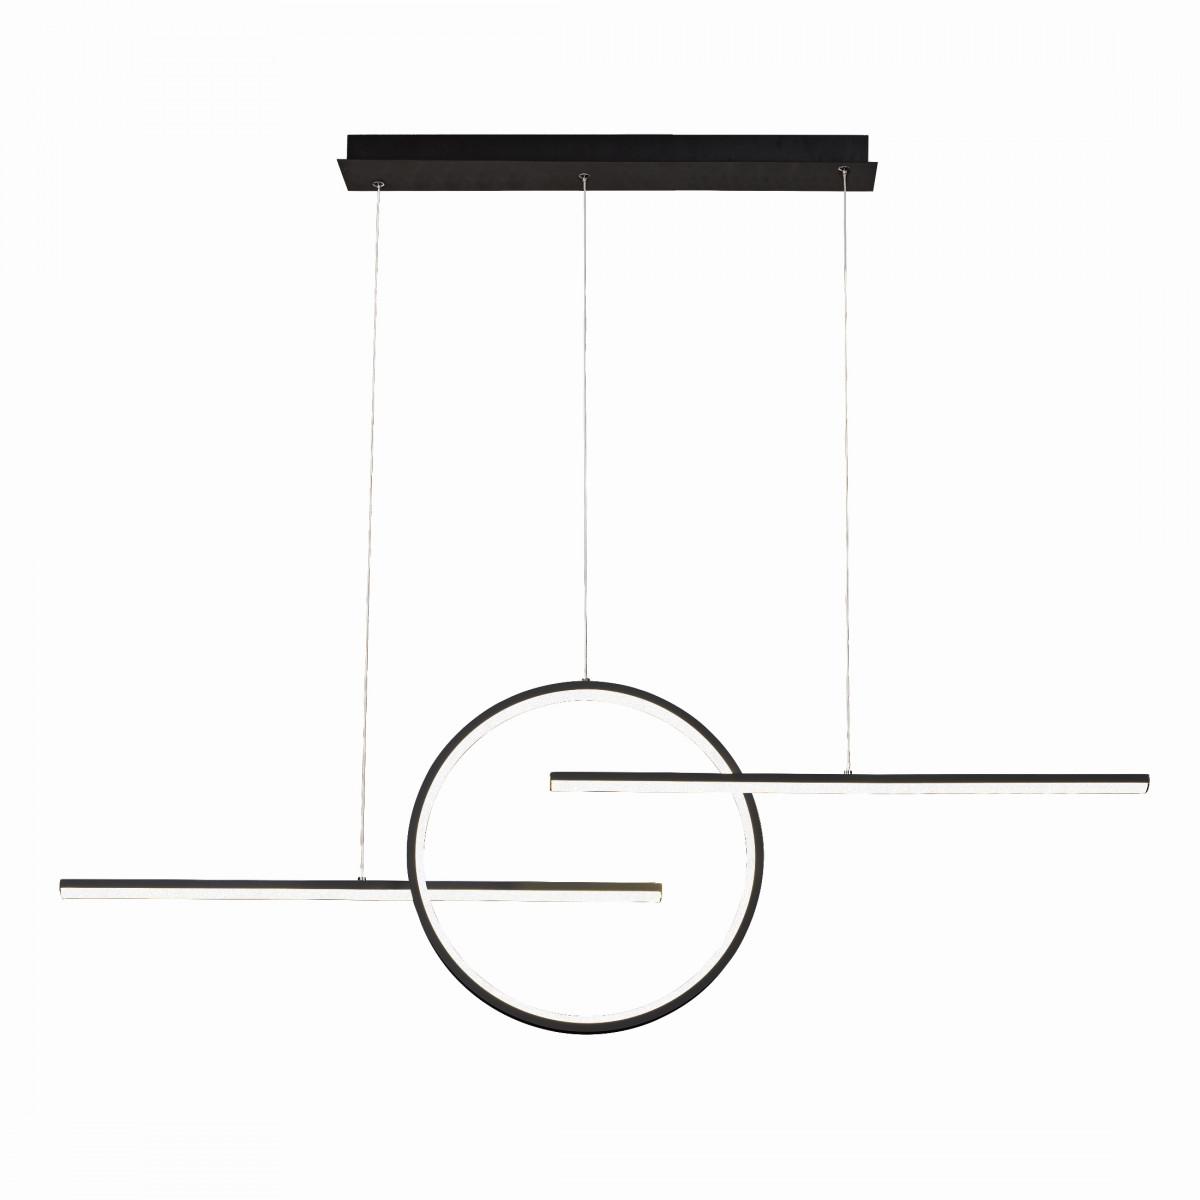 Pendul LED Mantra Kitesurf, 50W, negru